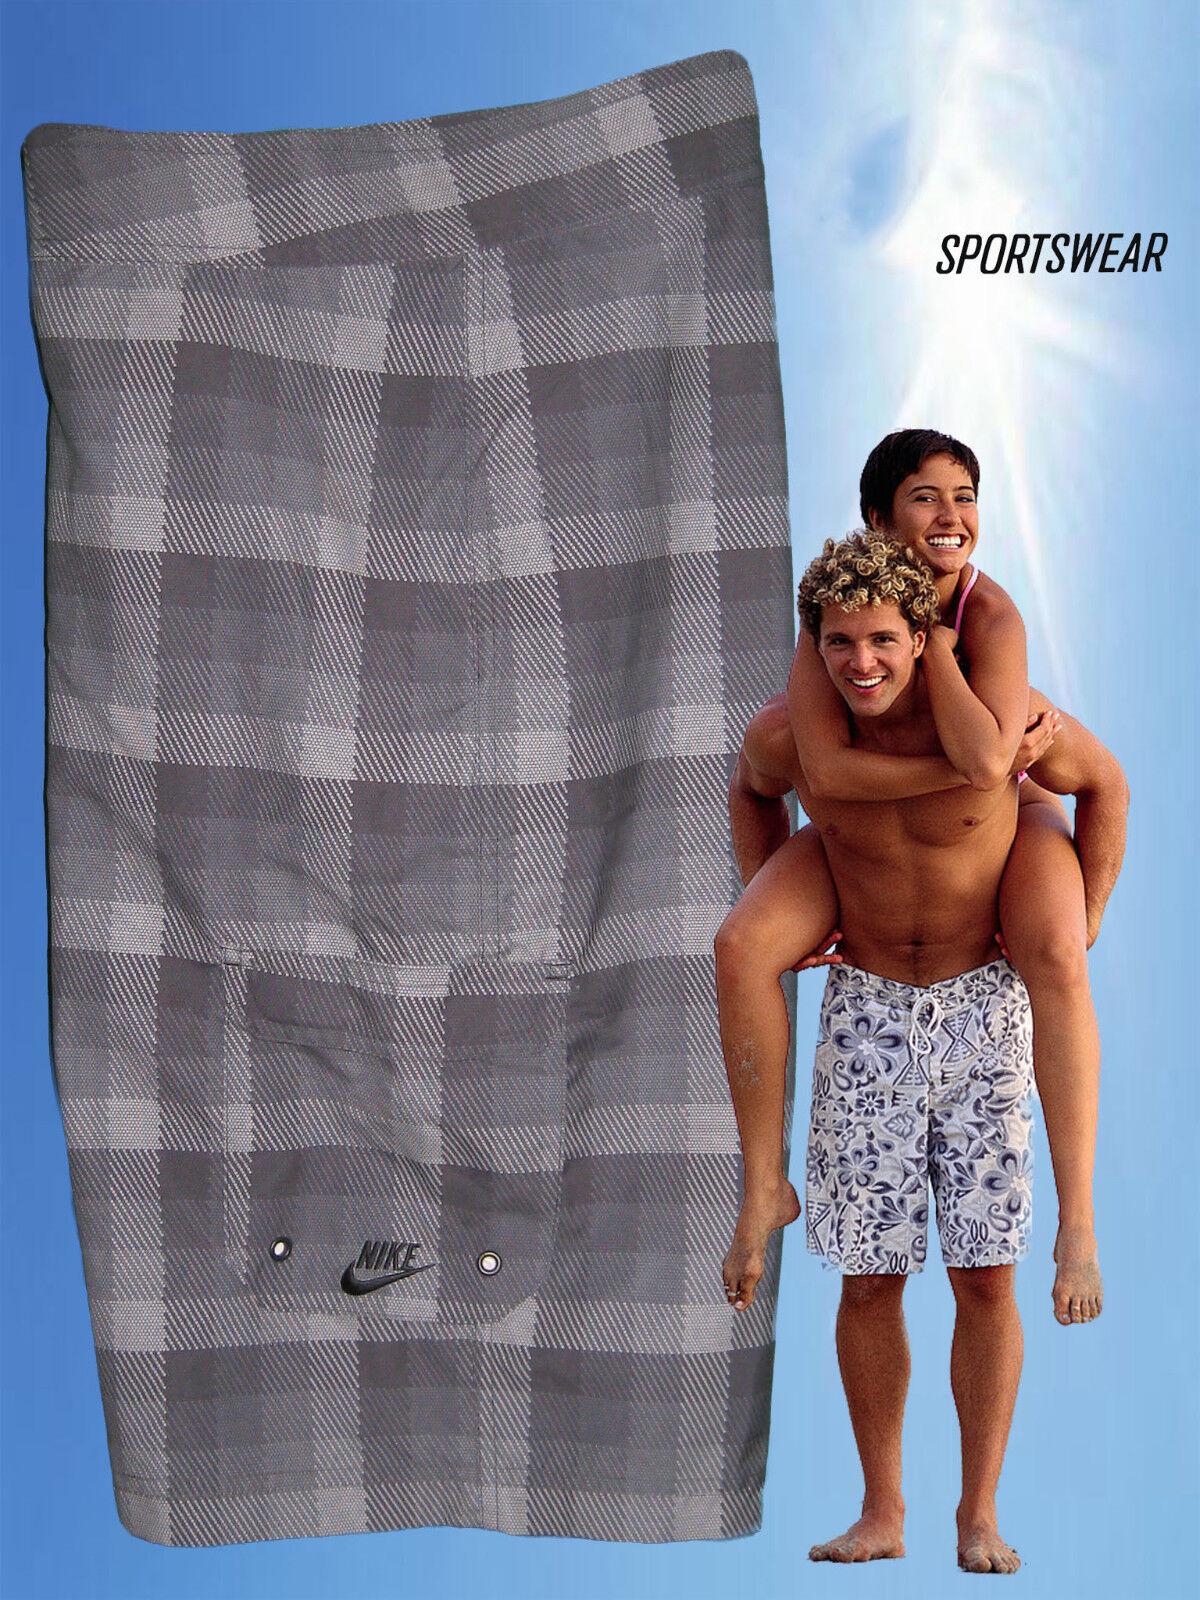 NEW NIKE Sportswear NSW Active Beach Water Sports Board Shorts Trunks Grey 32